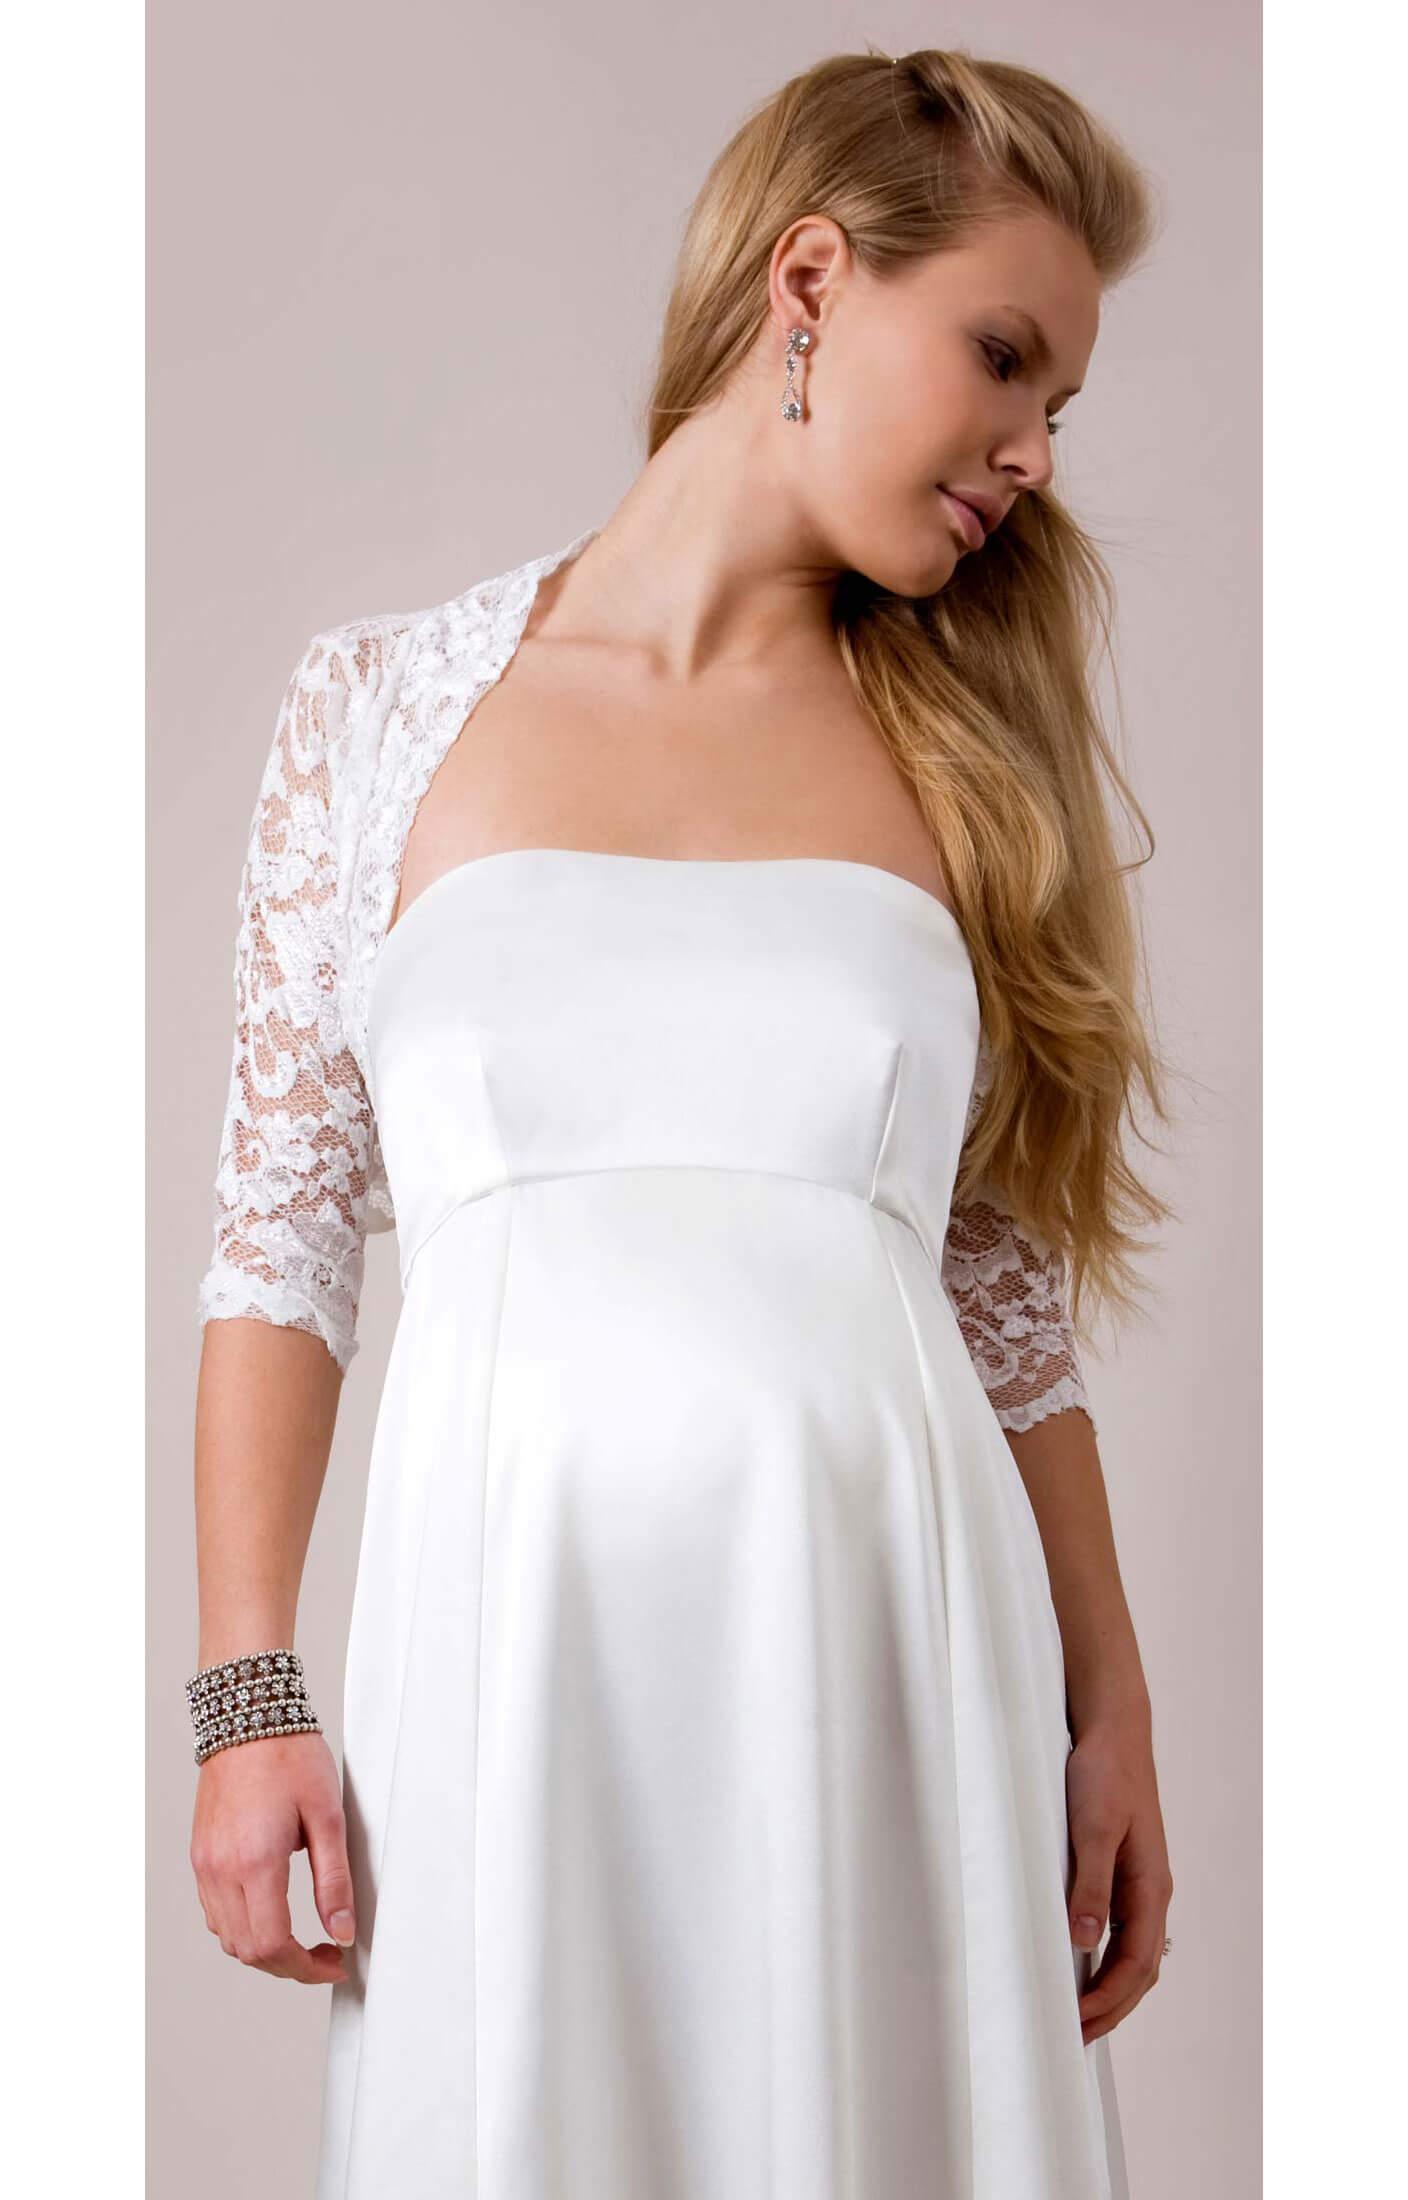 Lace bolero maternity wedding dresses evening wear and for Maternity lace wedding dresses